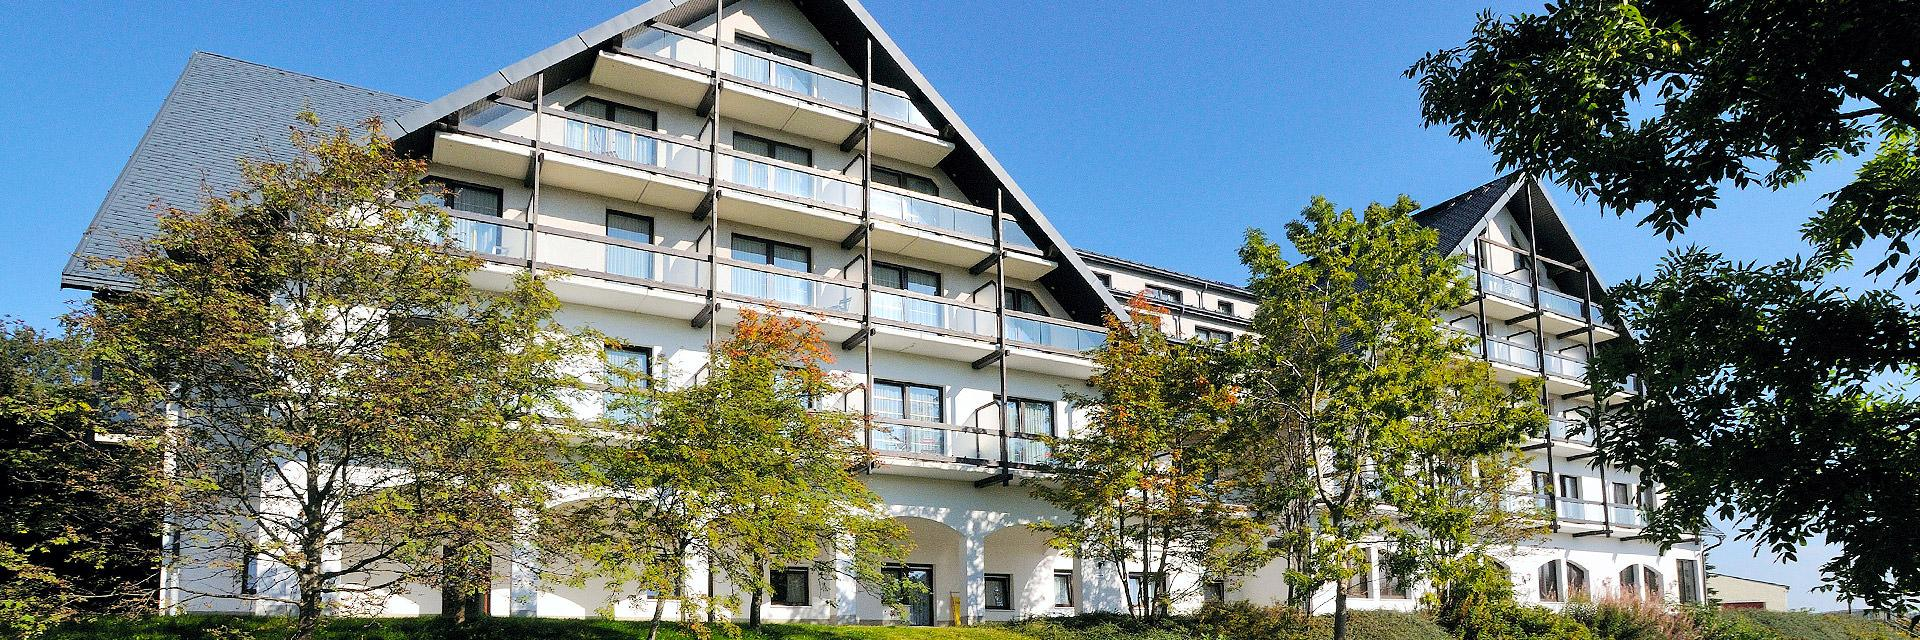 alpina lodge hotel oberwieselthal